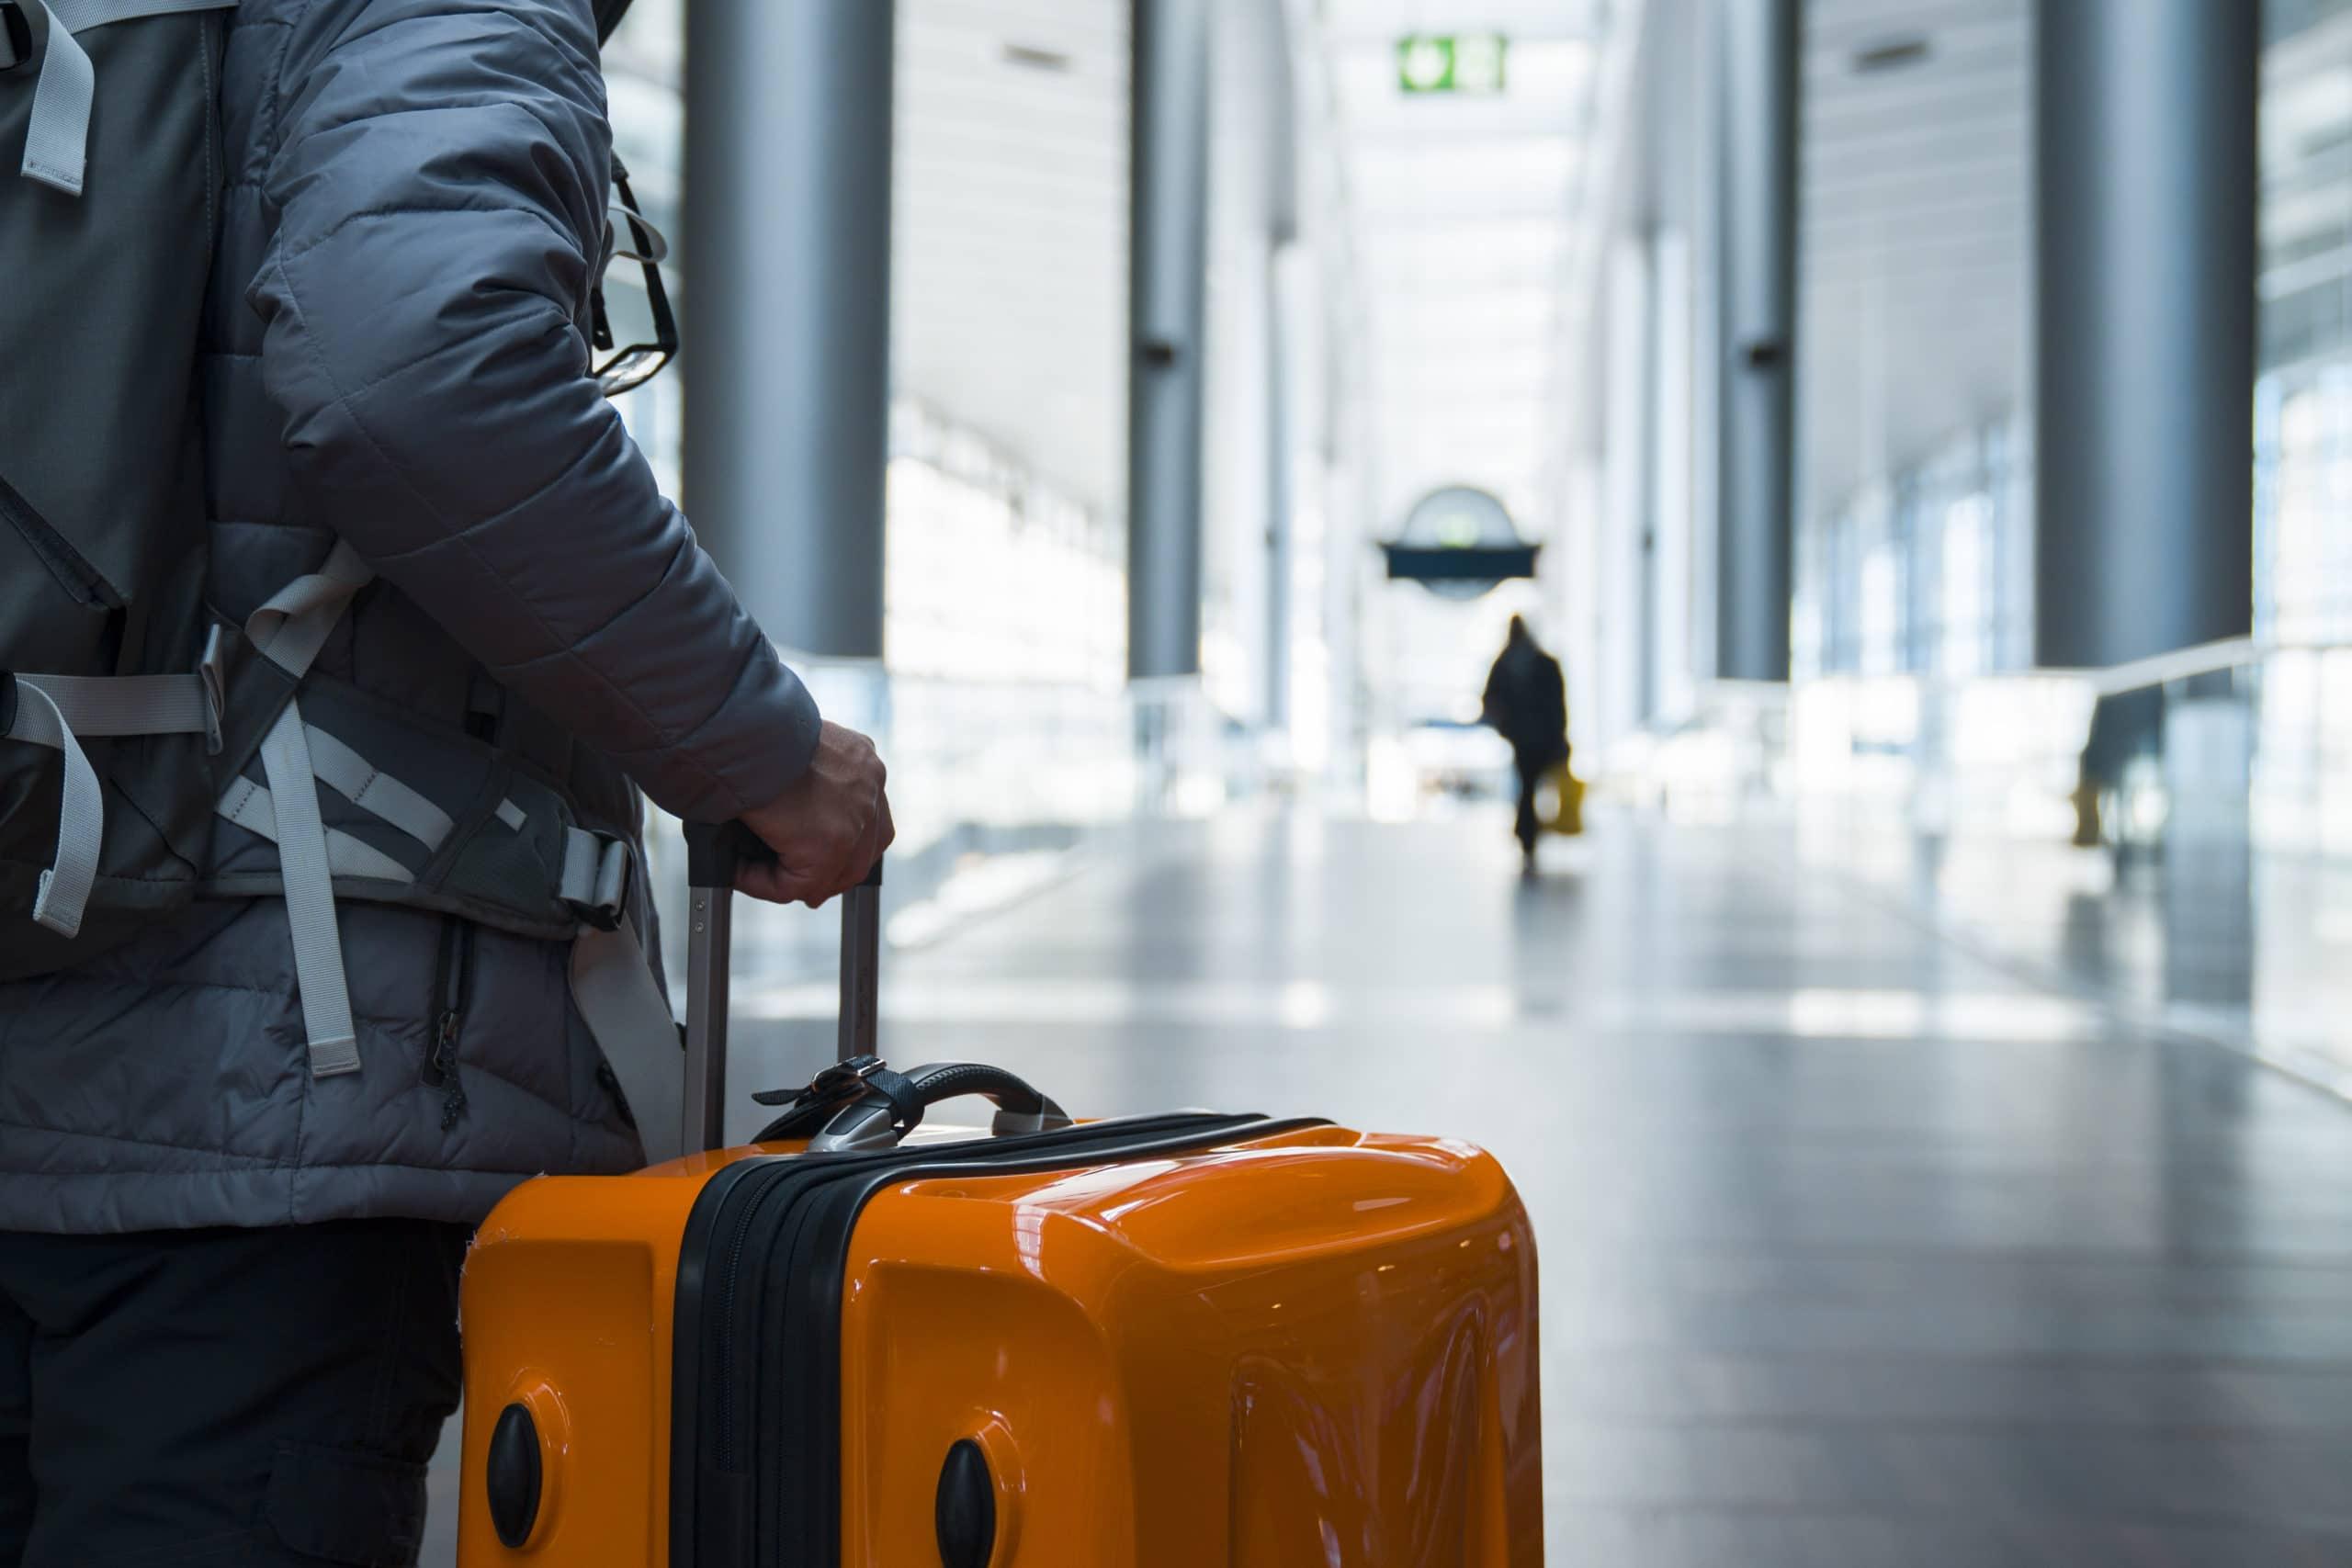 Man walking with suitcase at airport terminal